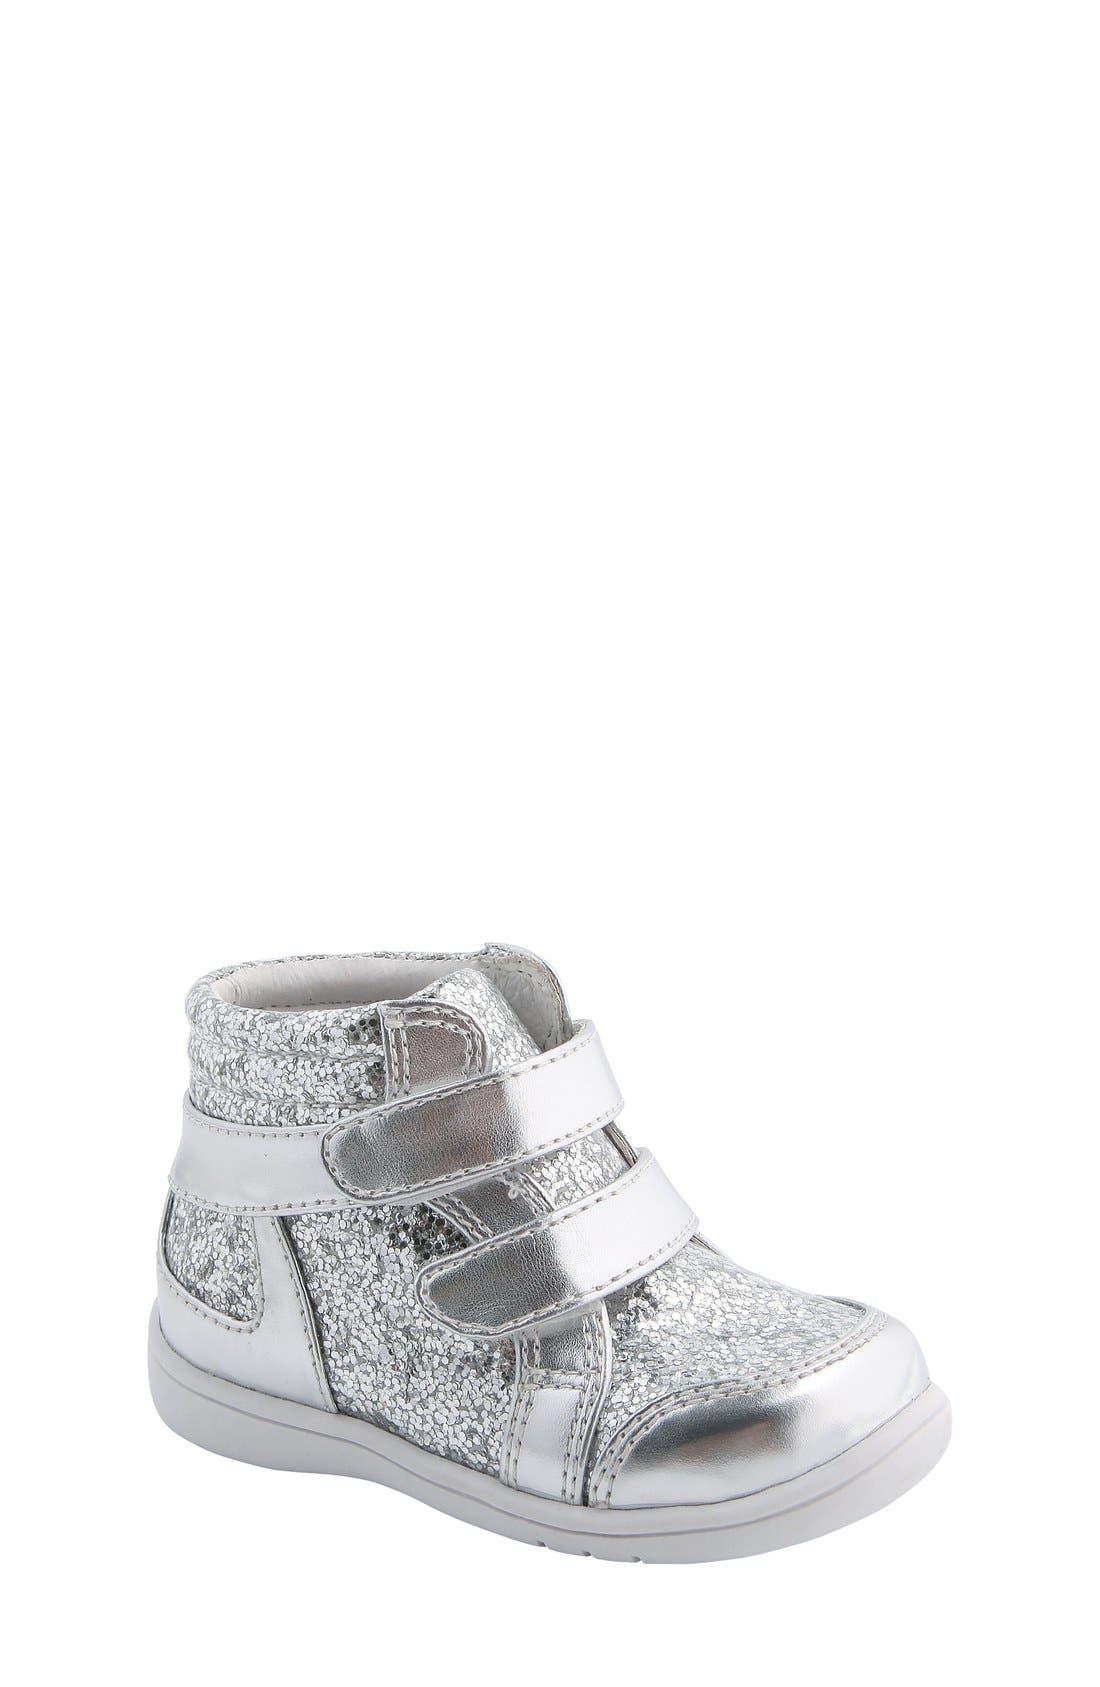 Nina 'Stardust' Metallic High Top Sneaker,                         Main,                         color, 047